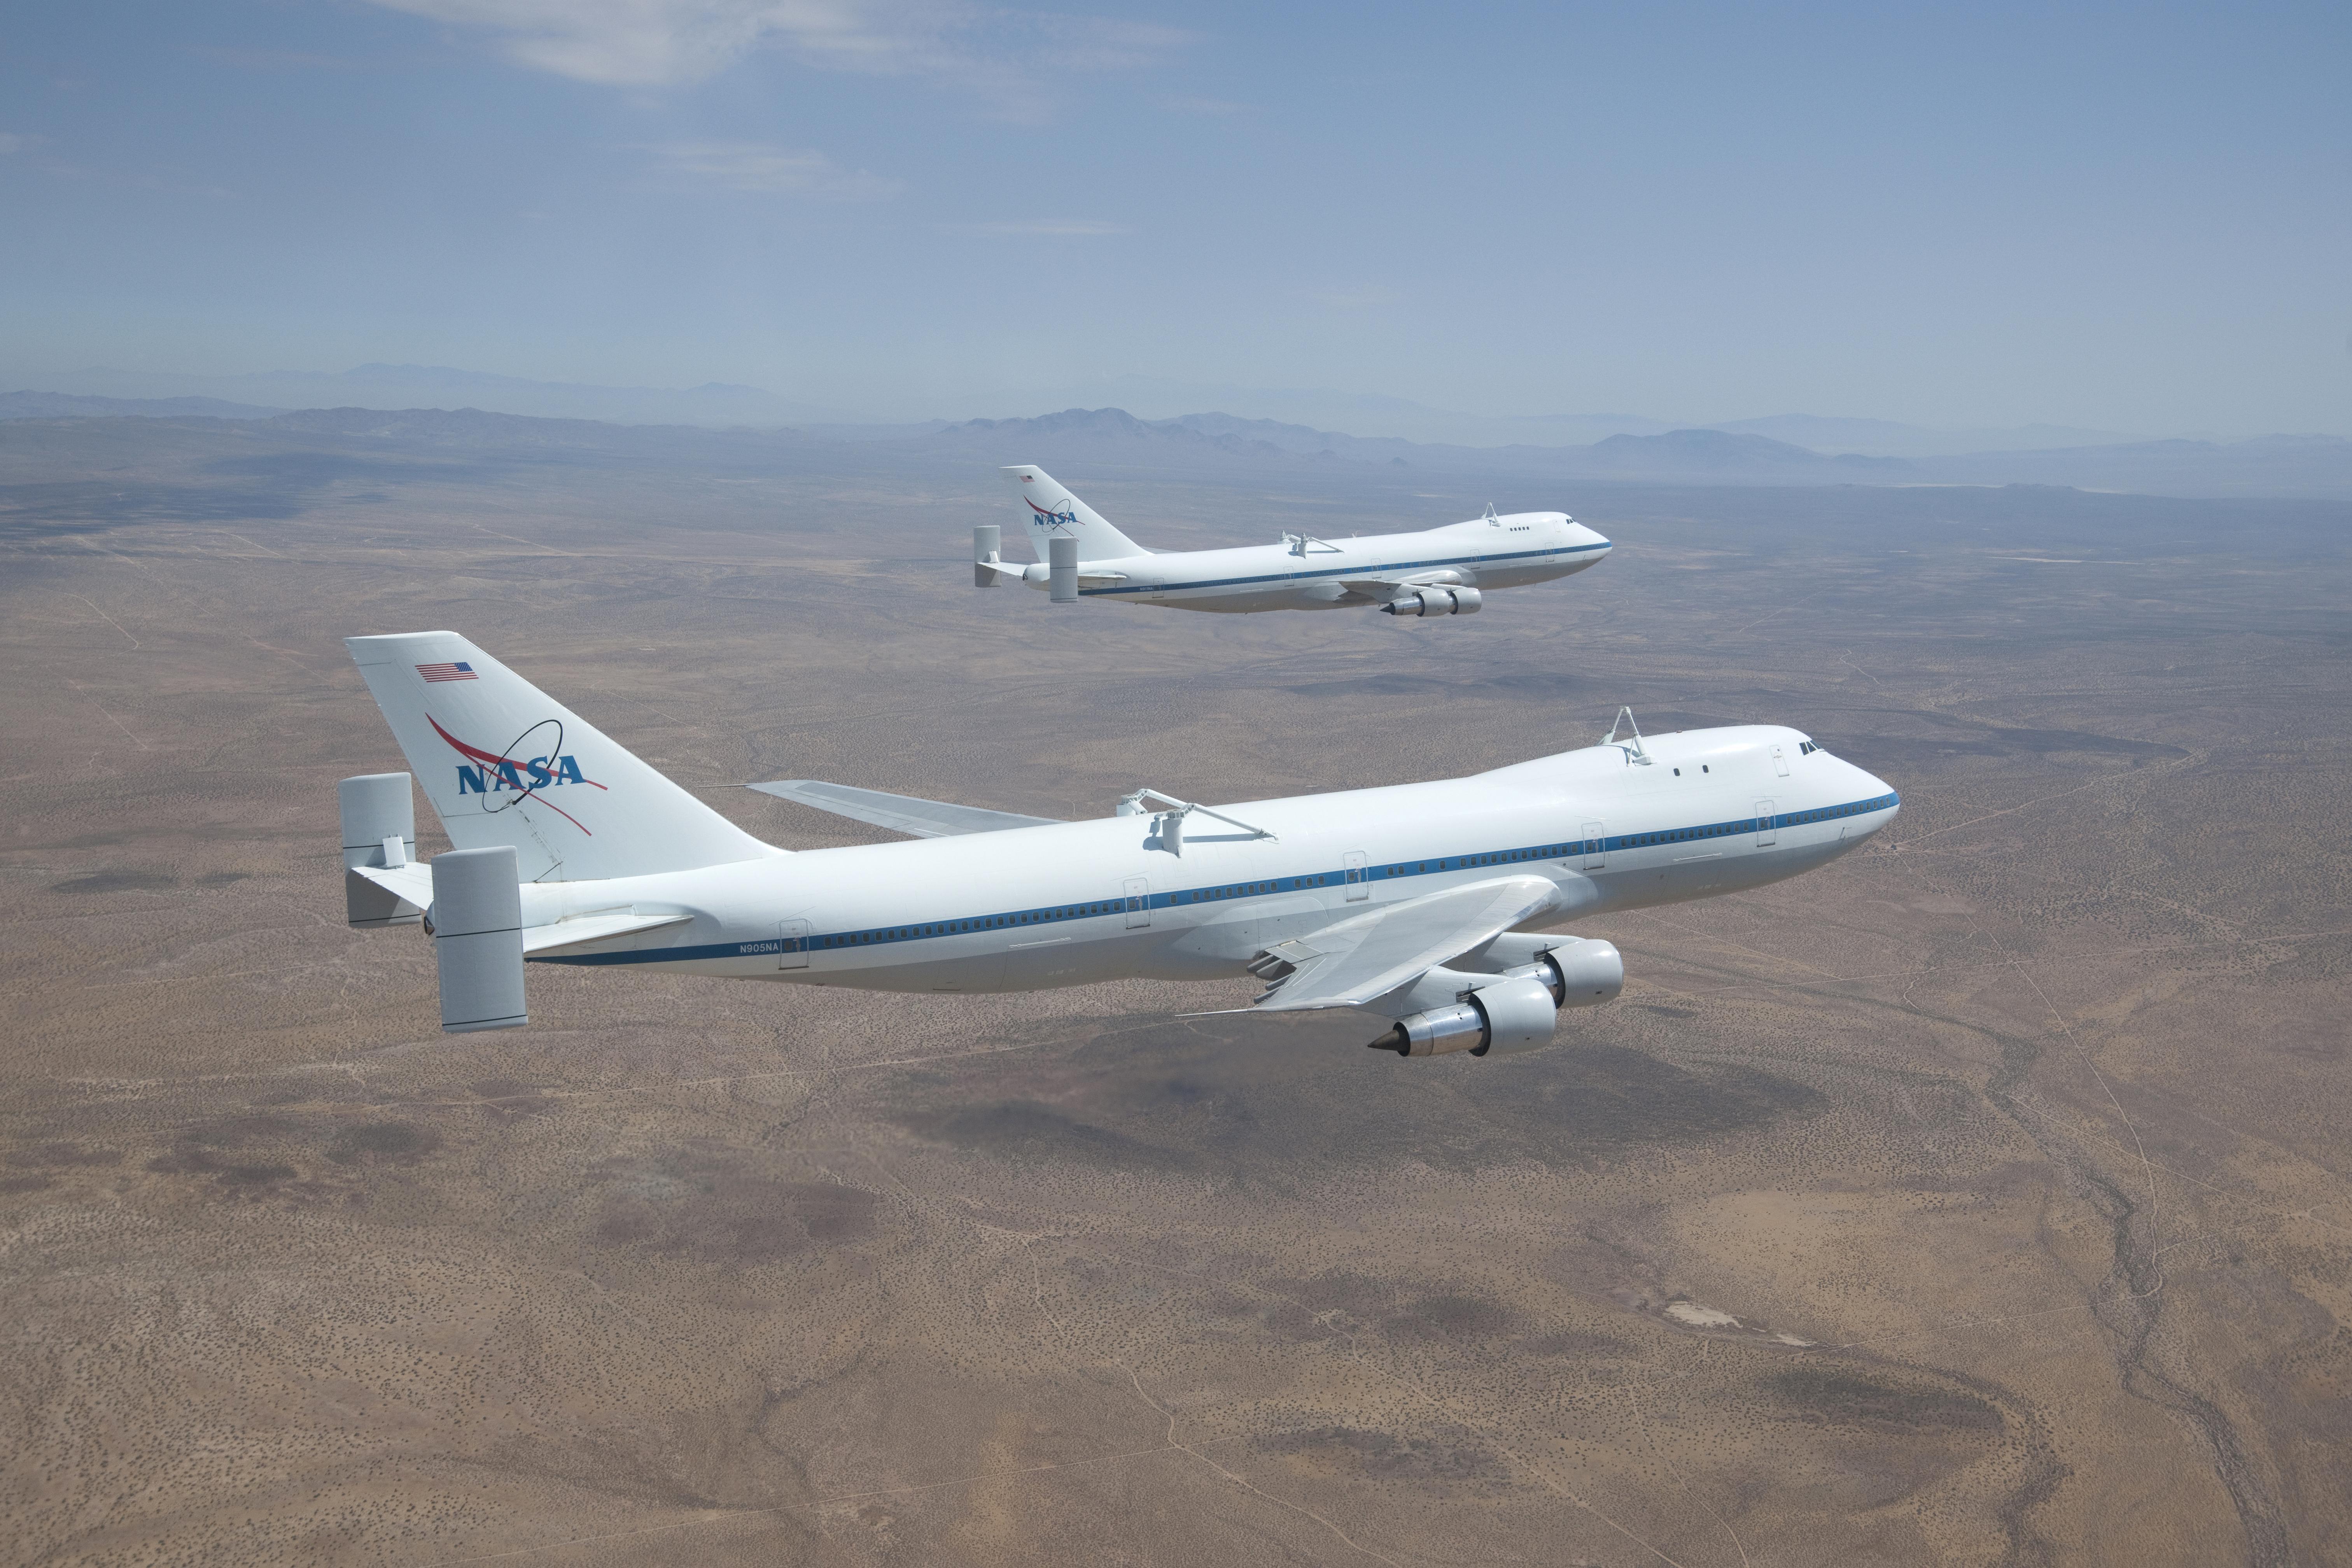 NASA's Original Shuttle Carrier Aircraft Departs Dryden   NASA